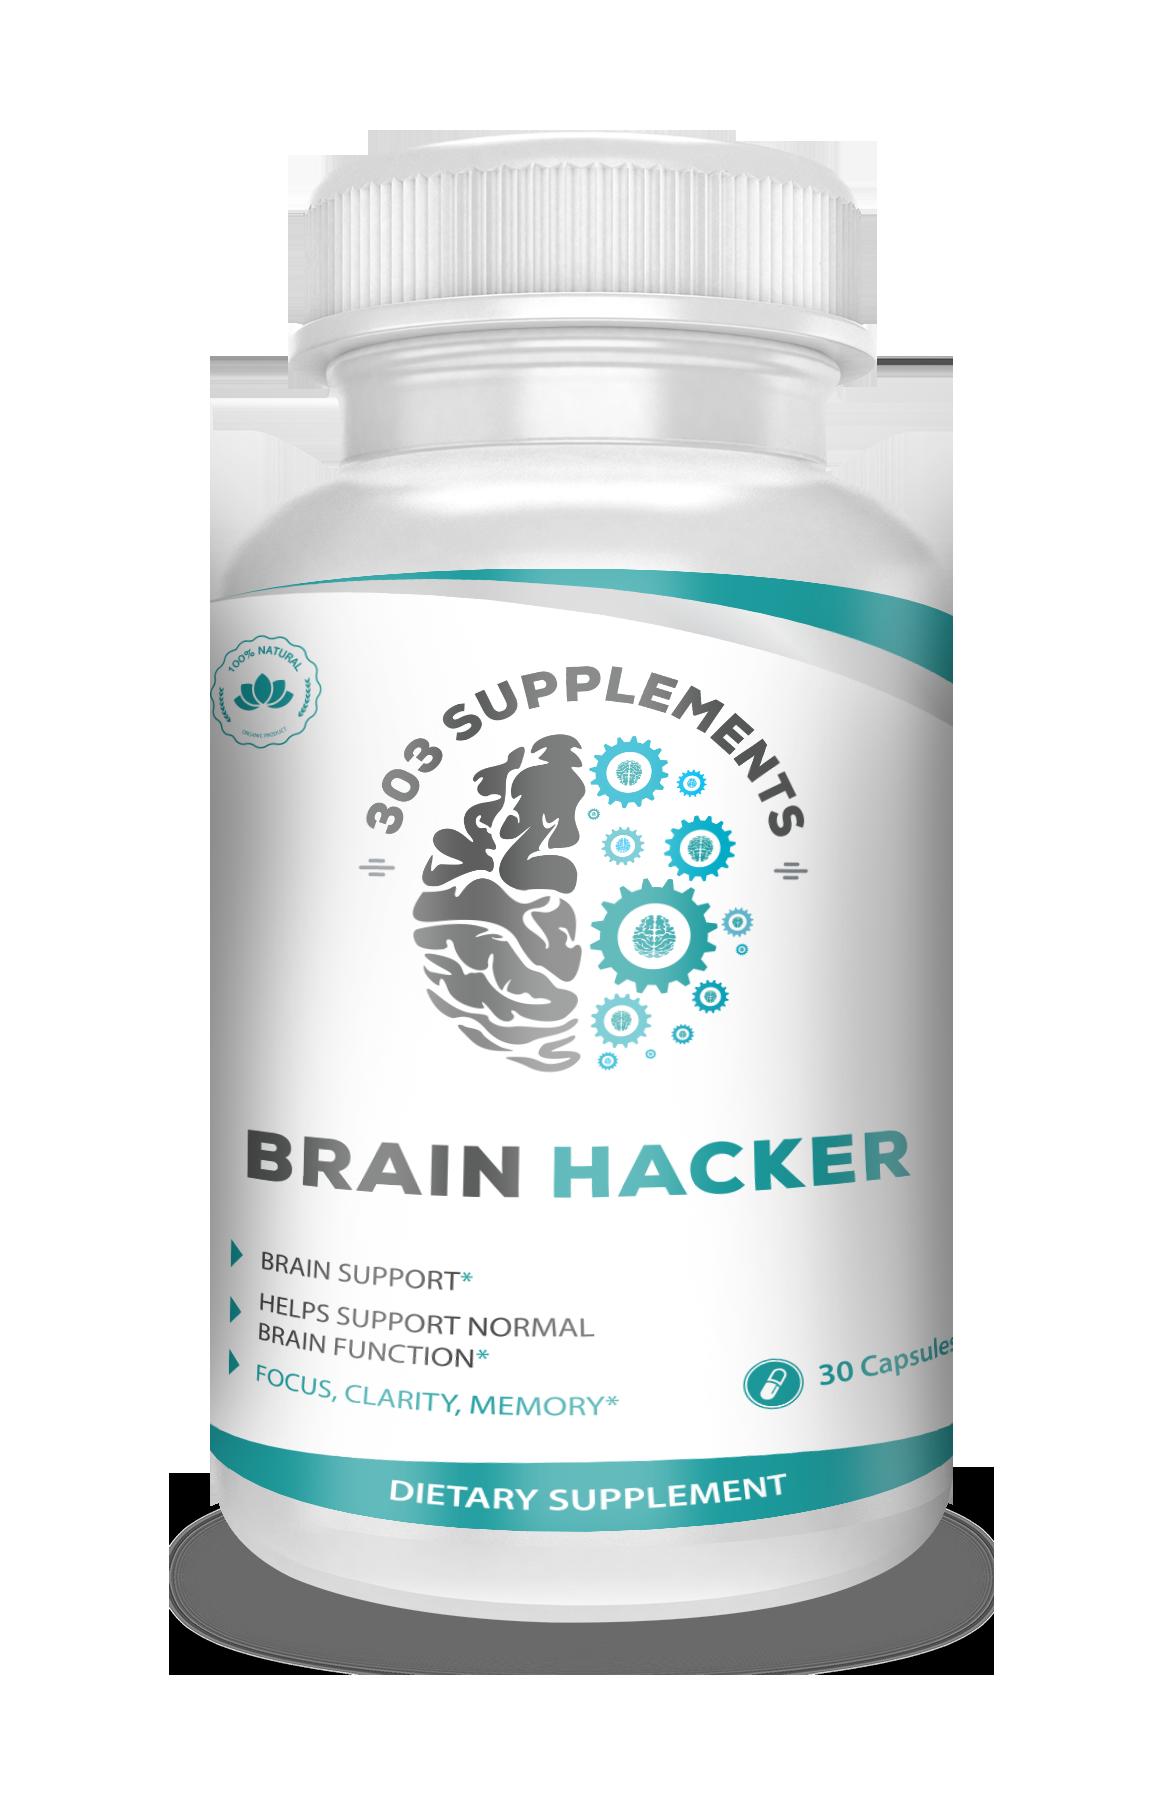 Brain Hacker Needs an EPIC Label Designed